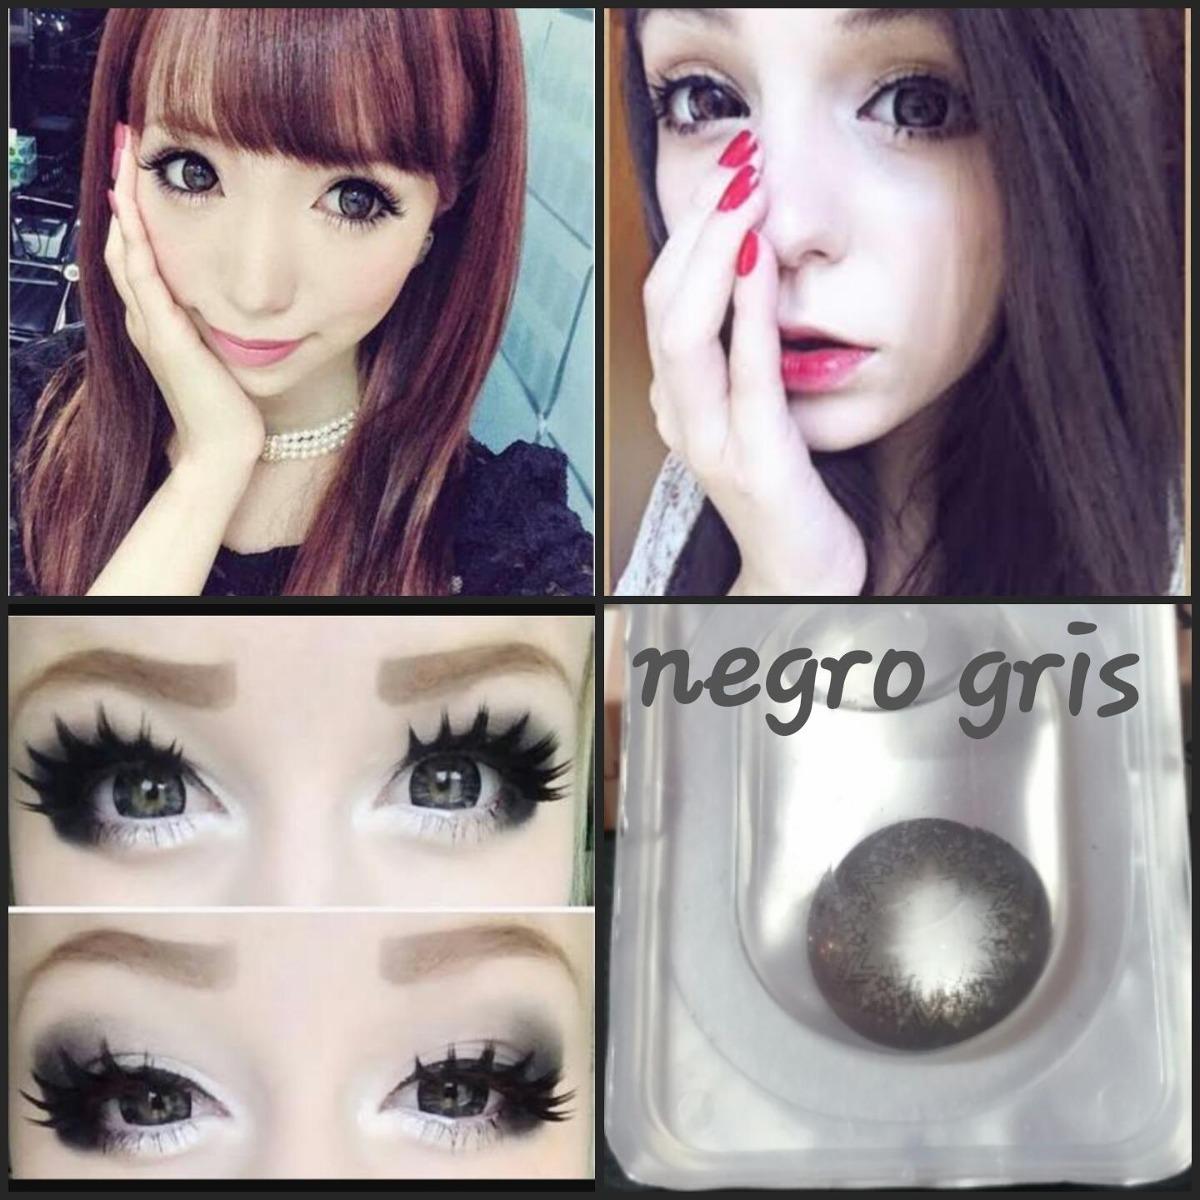 eb2382f9b3d38 pupilentes big eye ojo de muñeca lolita cosplay circle lens. Cargando zoom.